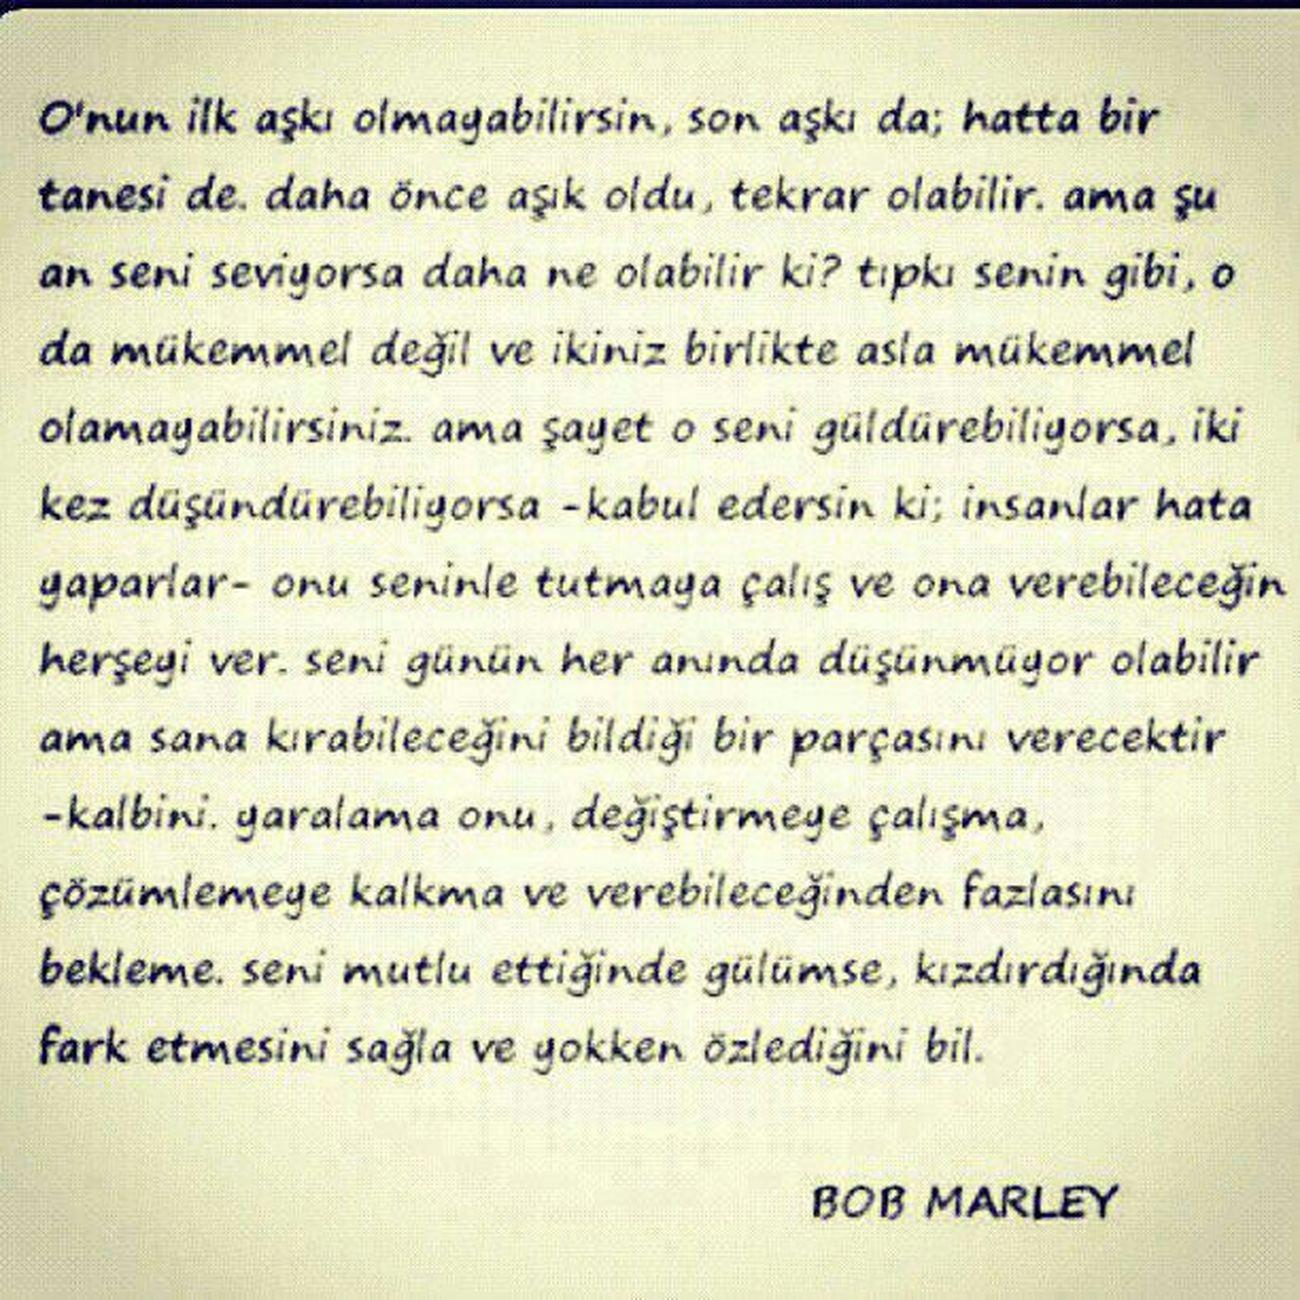 Bobmarley Smoke #weed #bobmarley Onelove #bobmarley ;)